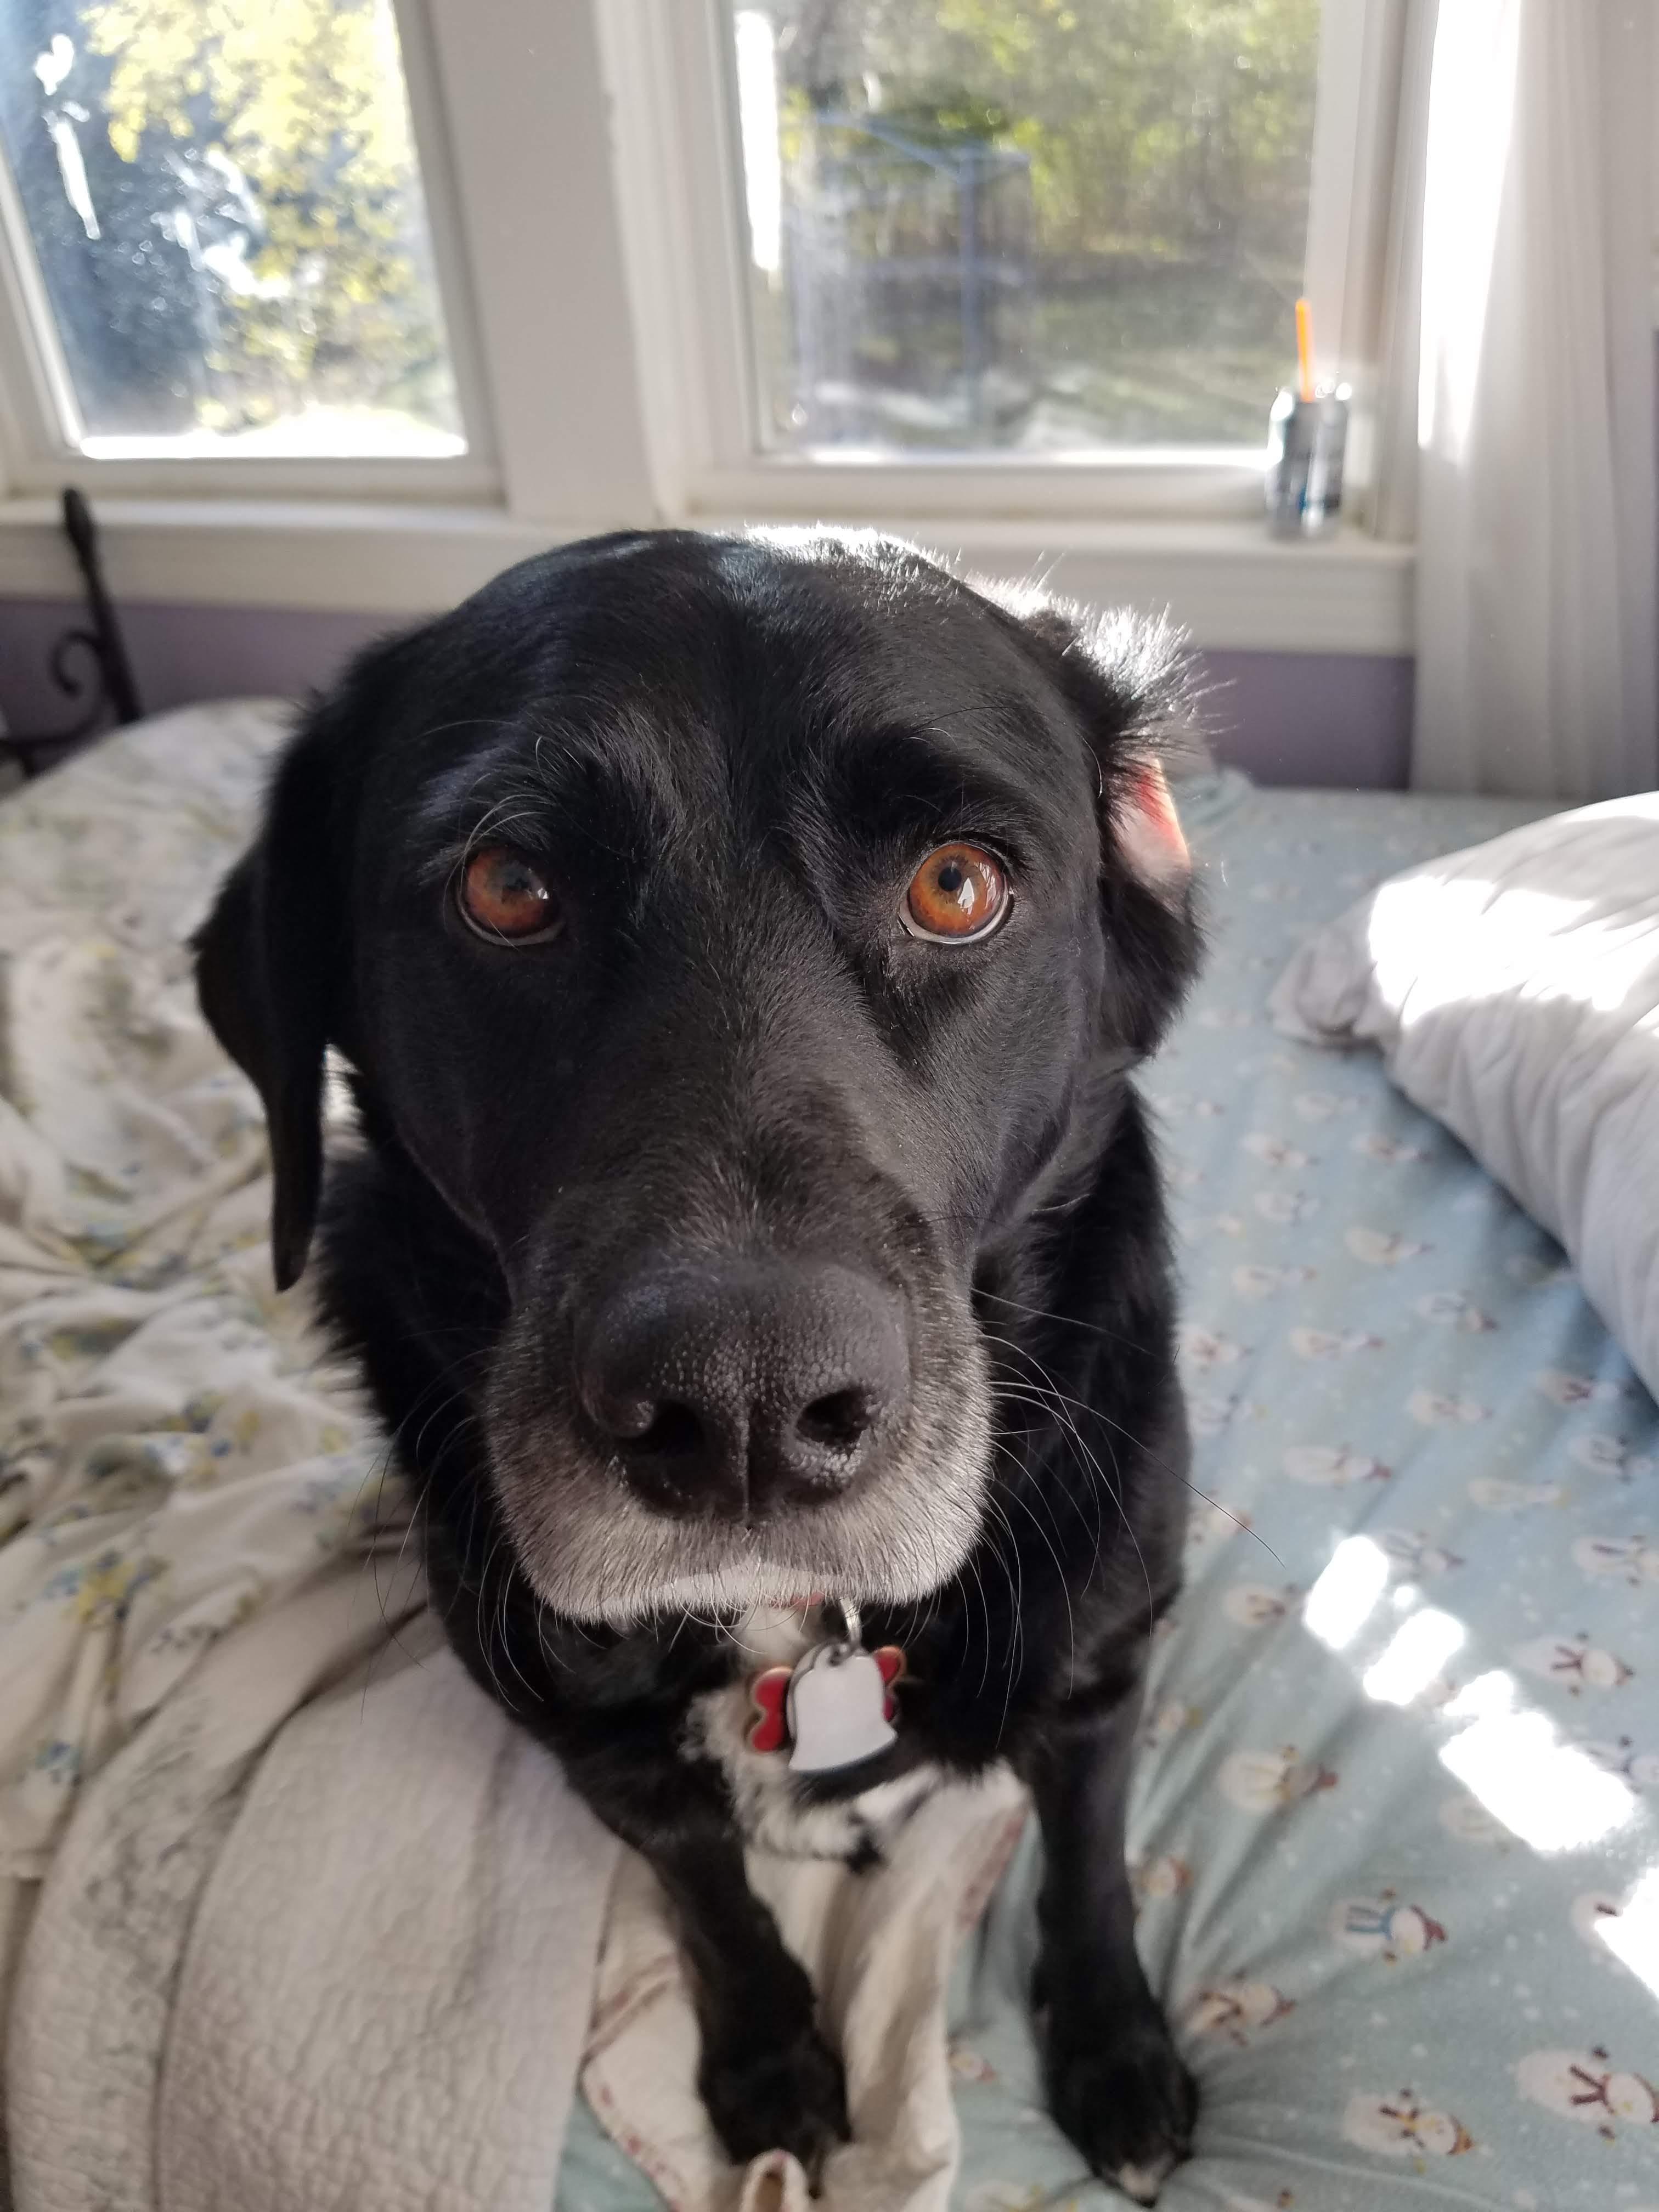 Labrador - black - dog - canine - puppies